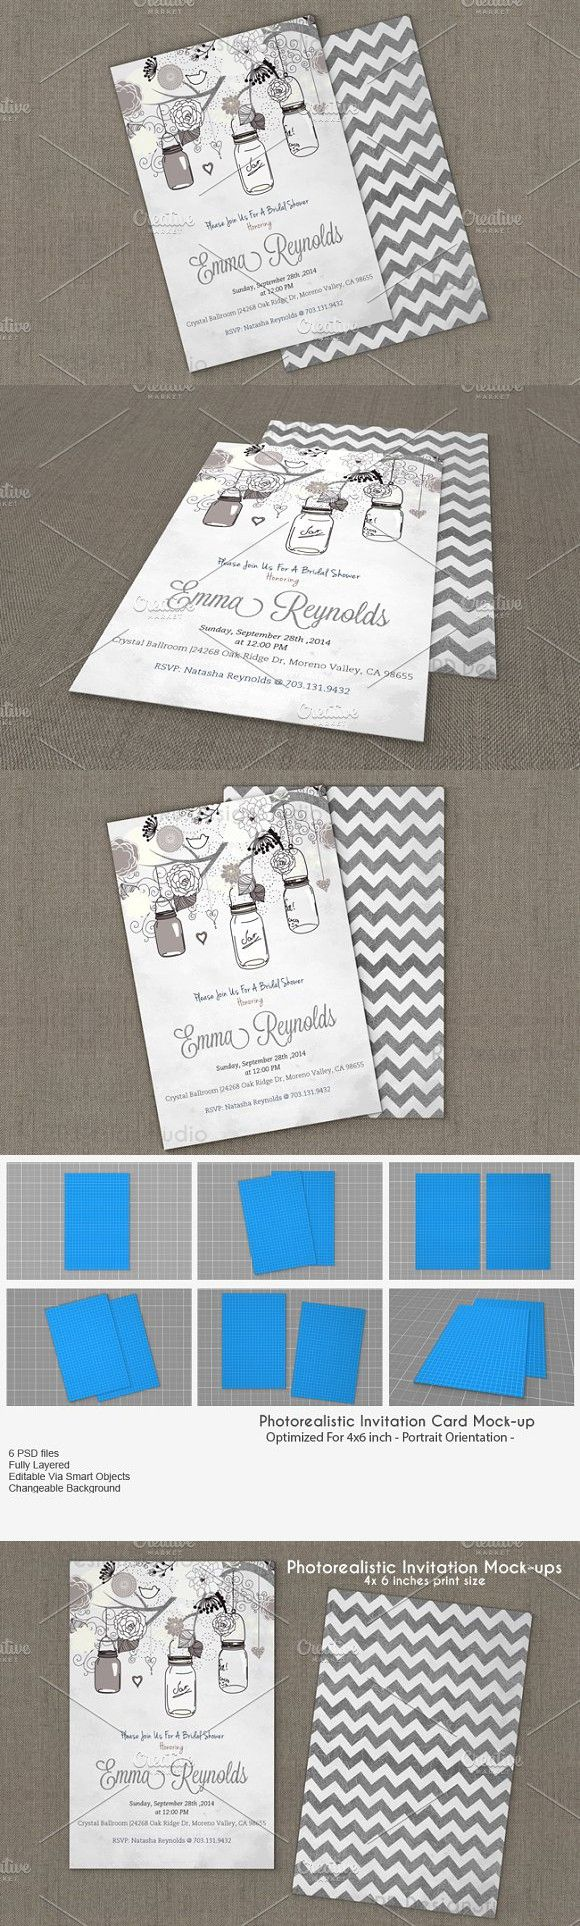 4x6 Inches Invitation Card Mockup V2 Business Card Mock Up Invitation Cards Invitation Mockup